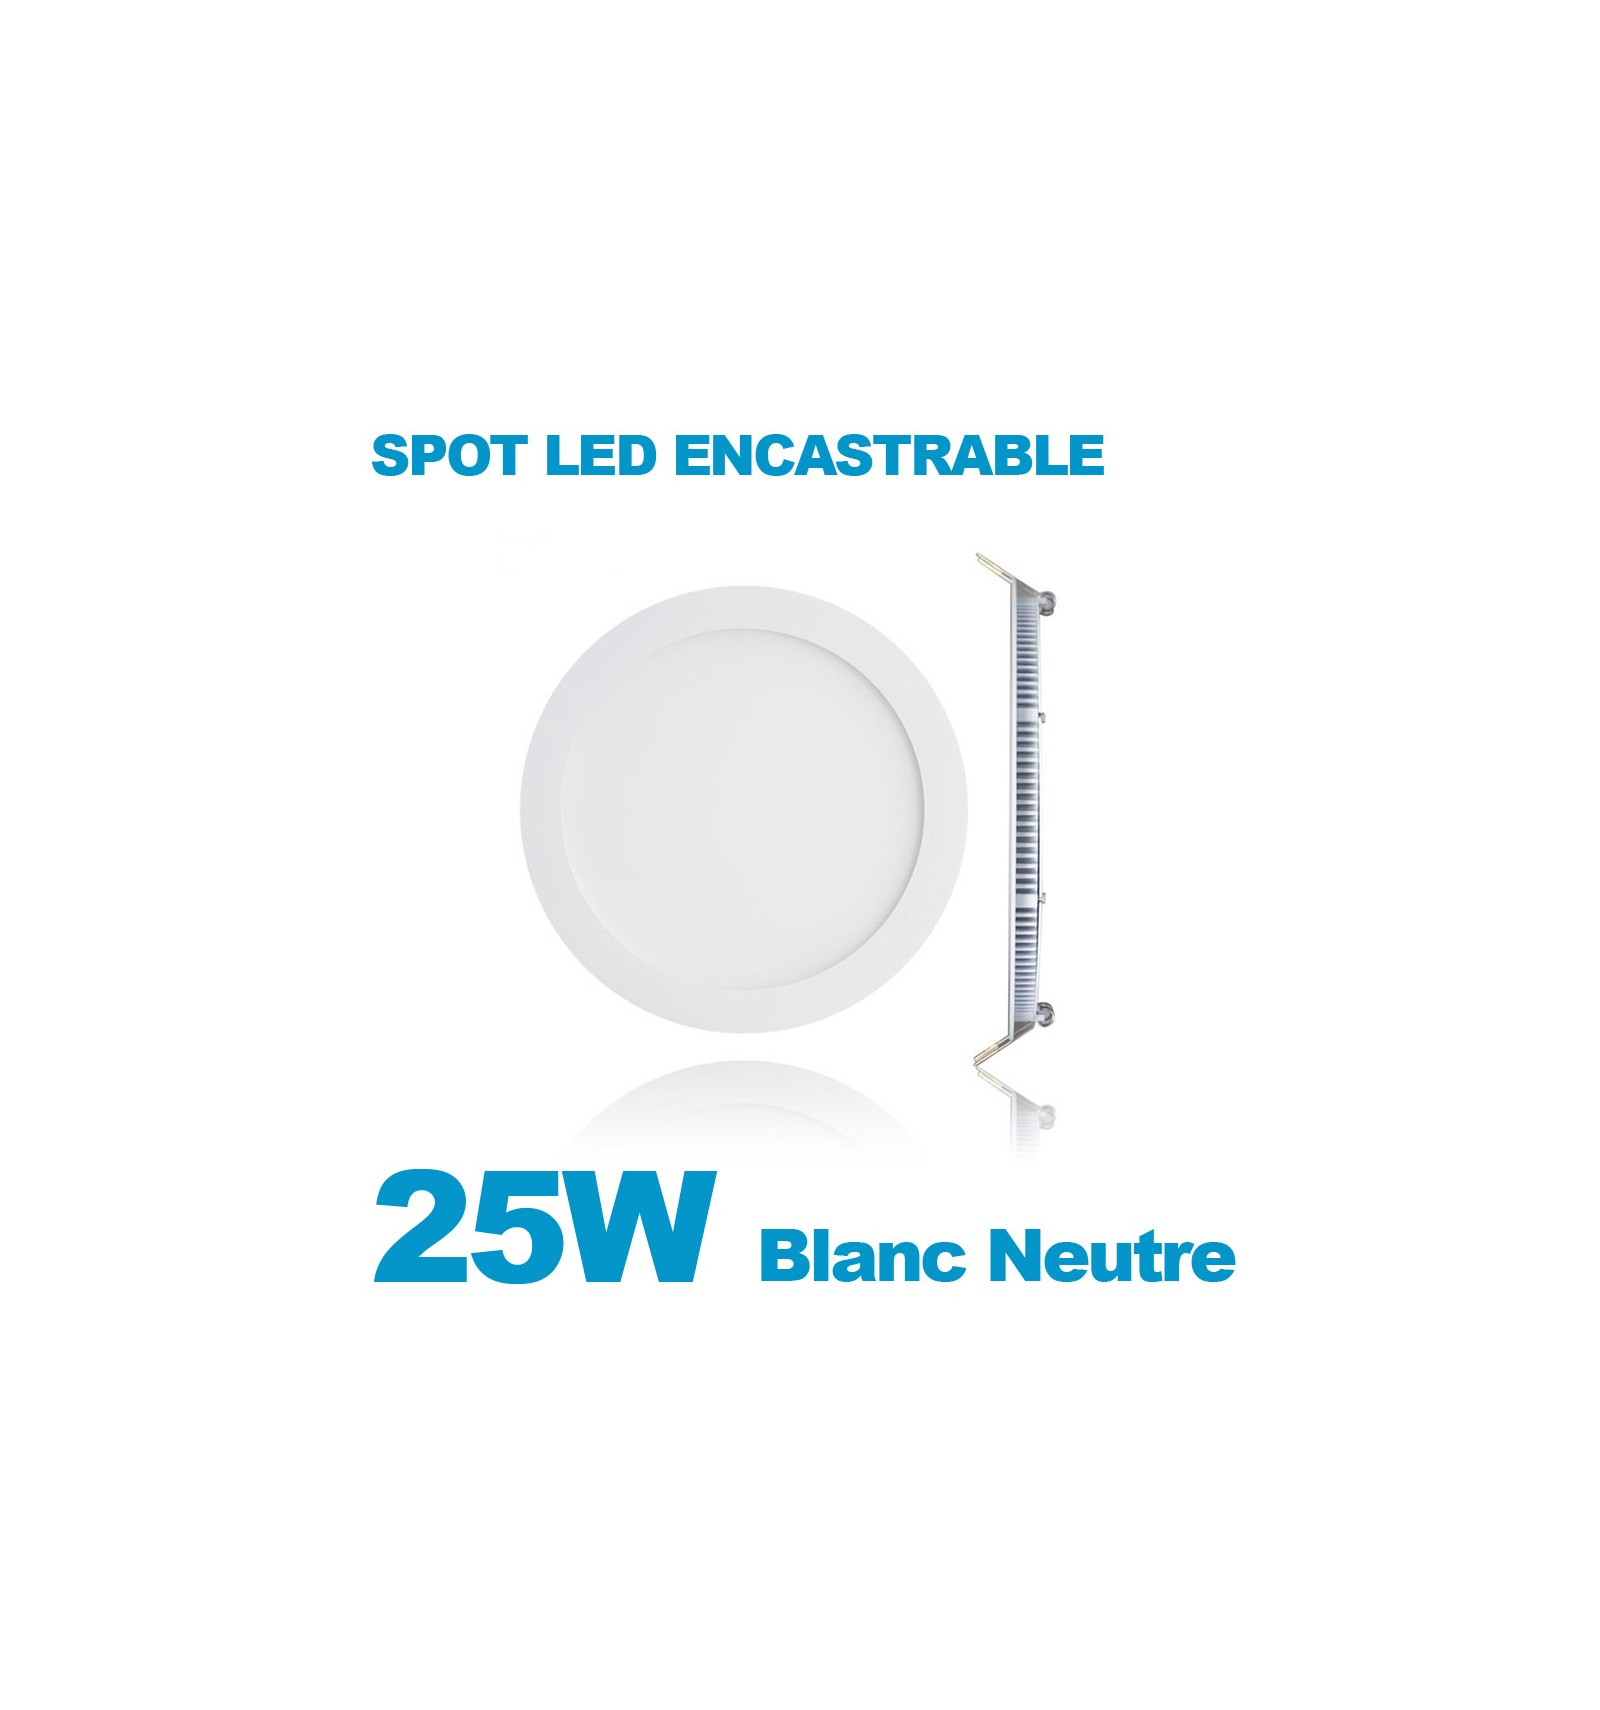 spot encastrable led downlight panel extra plat 25w blanc neutre 4000k. Black Bedroom Furniture Sets. Home Design Ideas